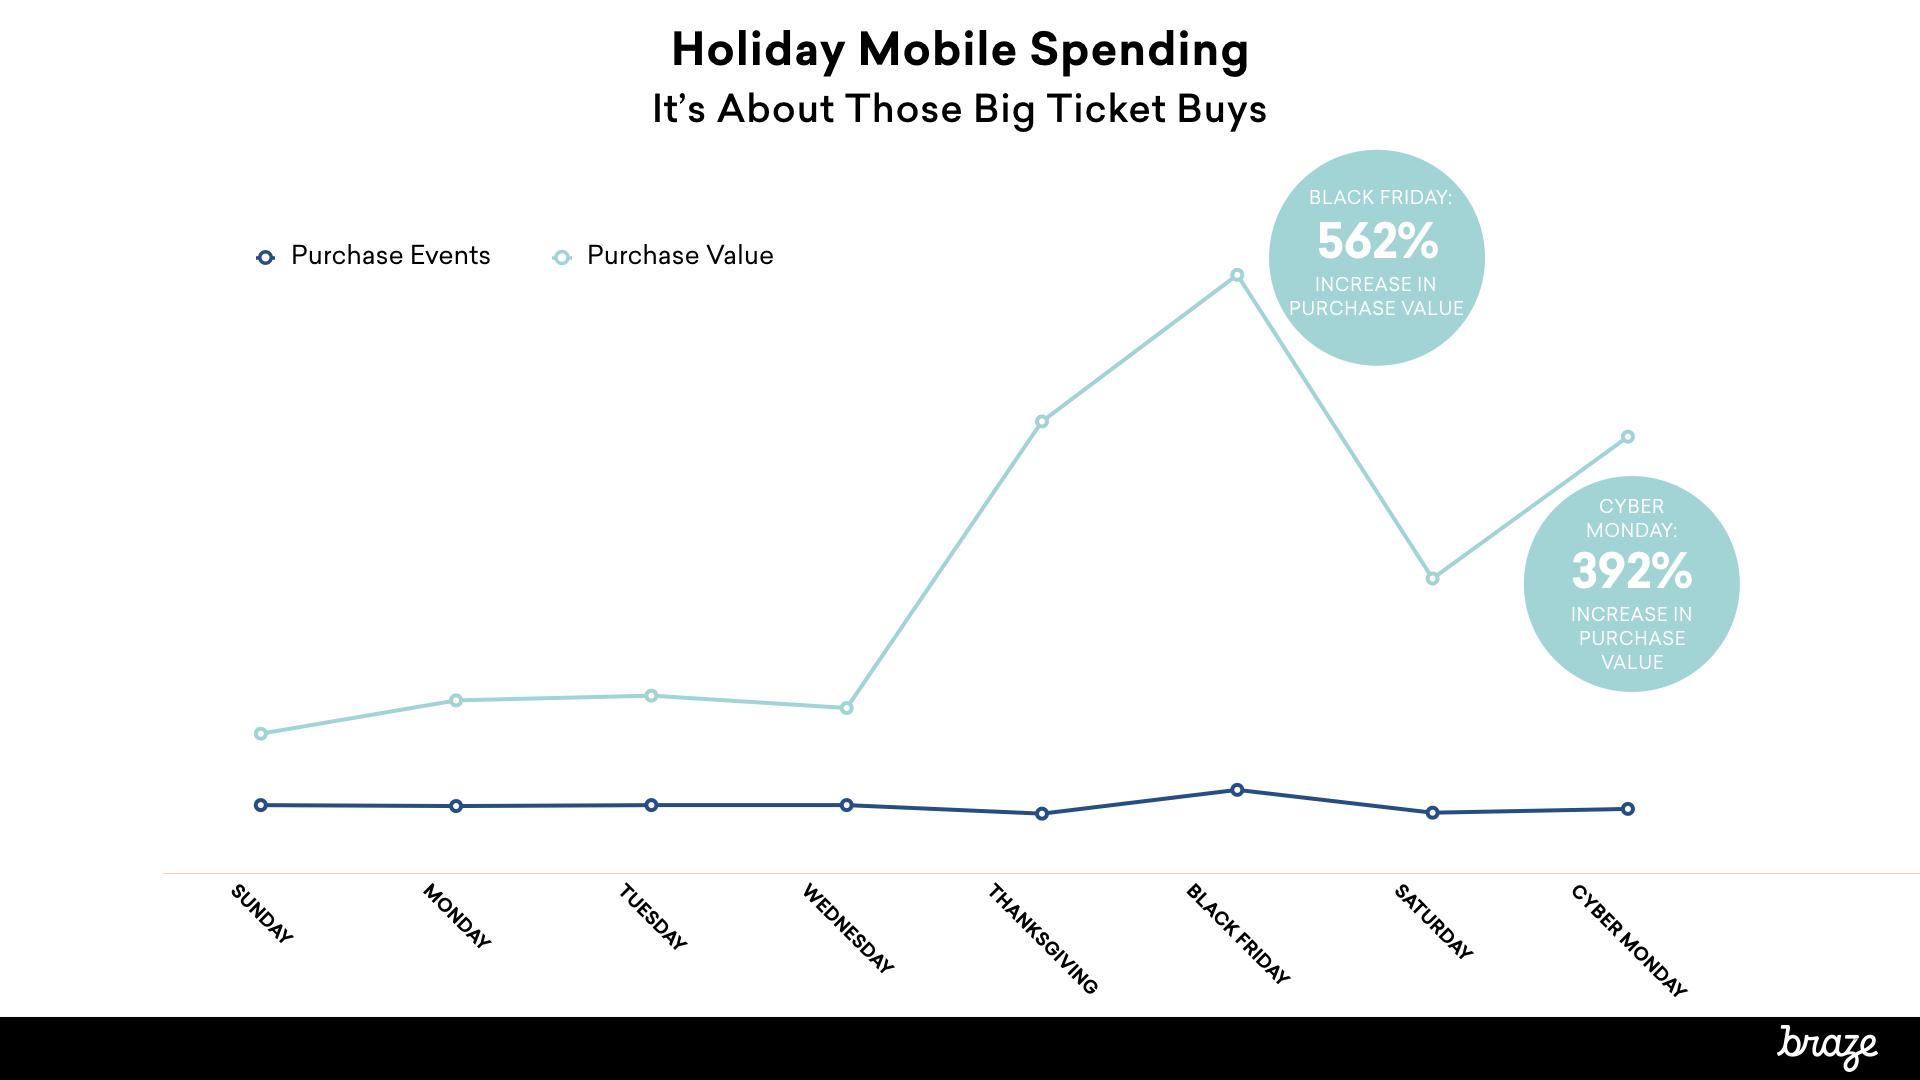 Holiday mobile data